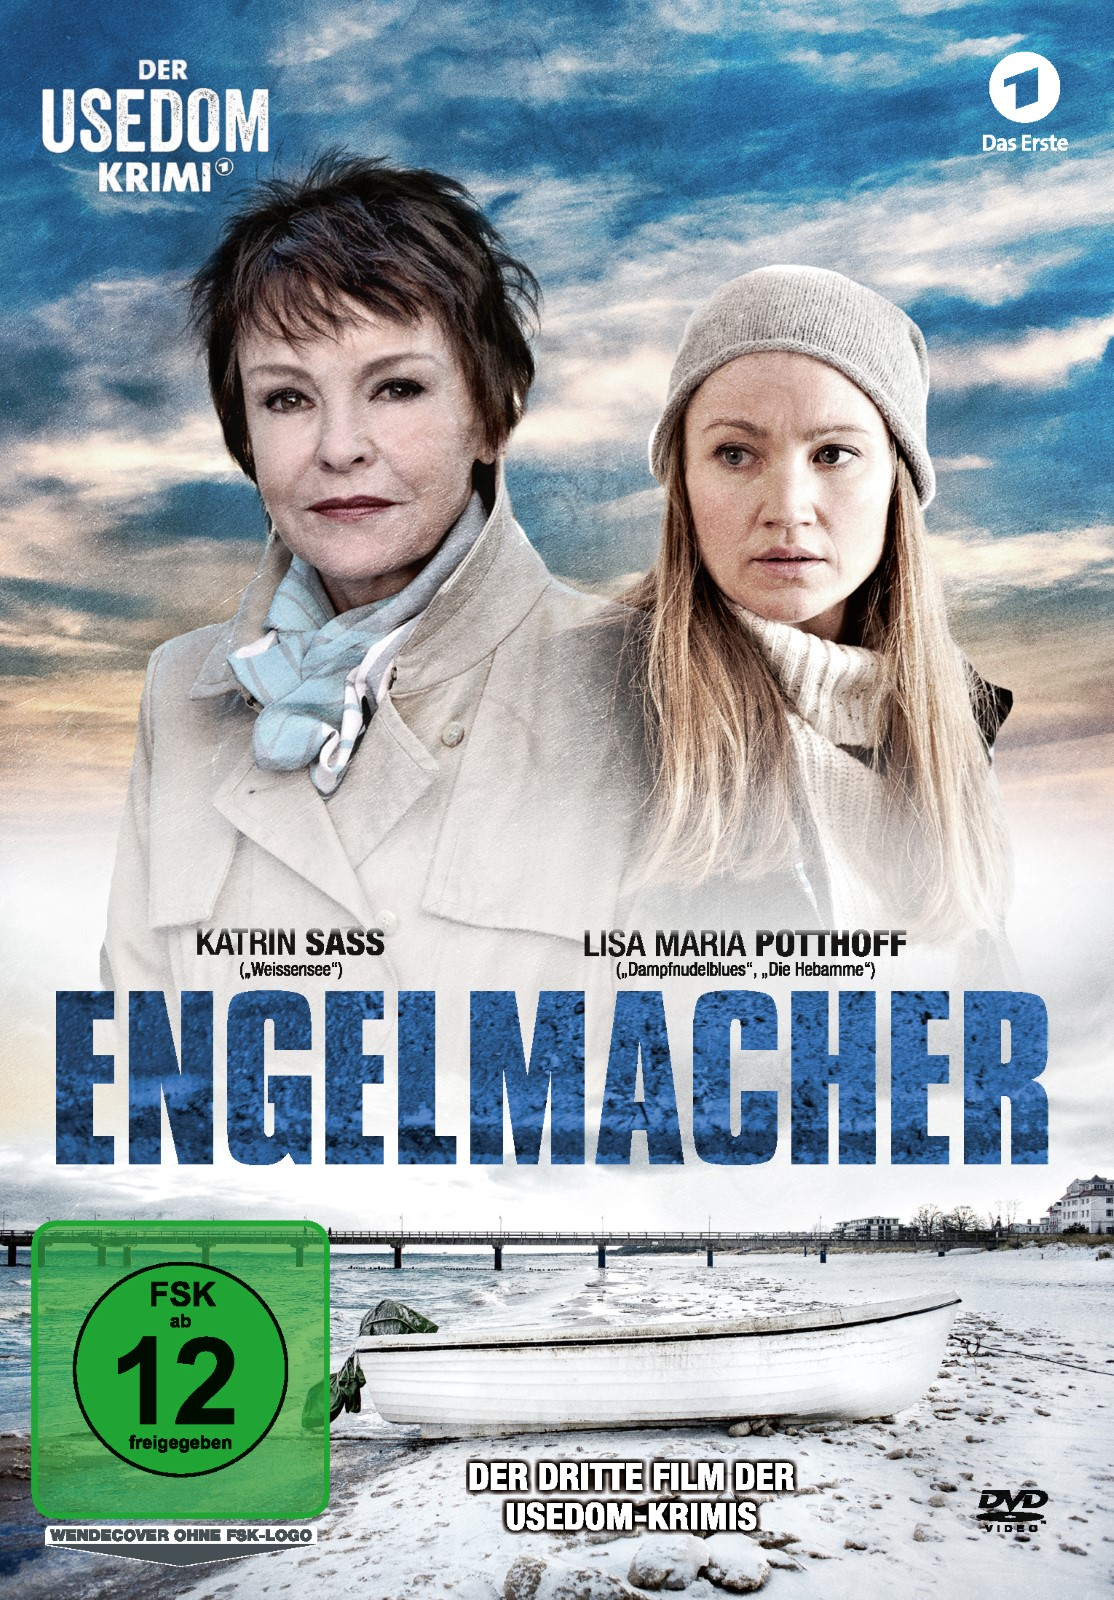 Usedom Krimi Engelmacher